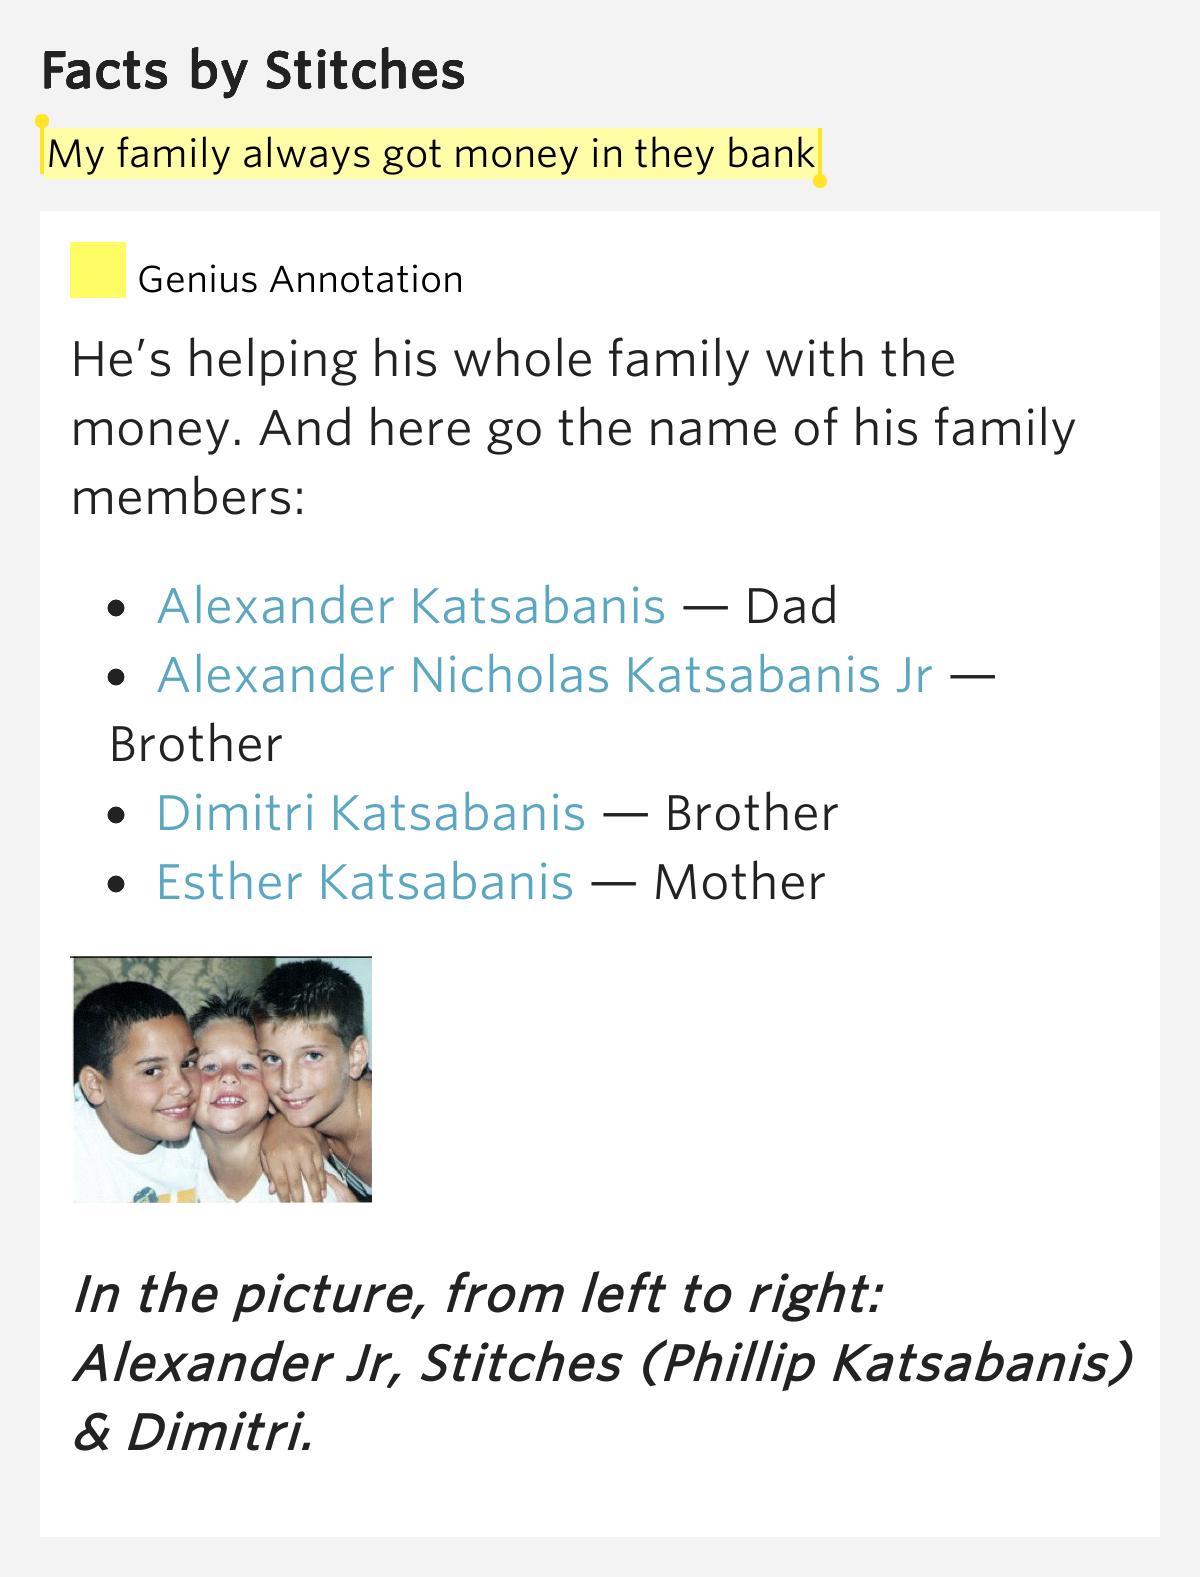 Lyrics containing the term: money